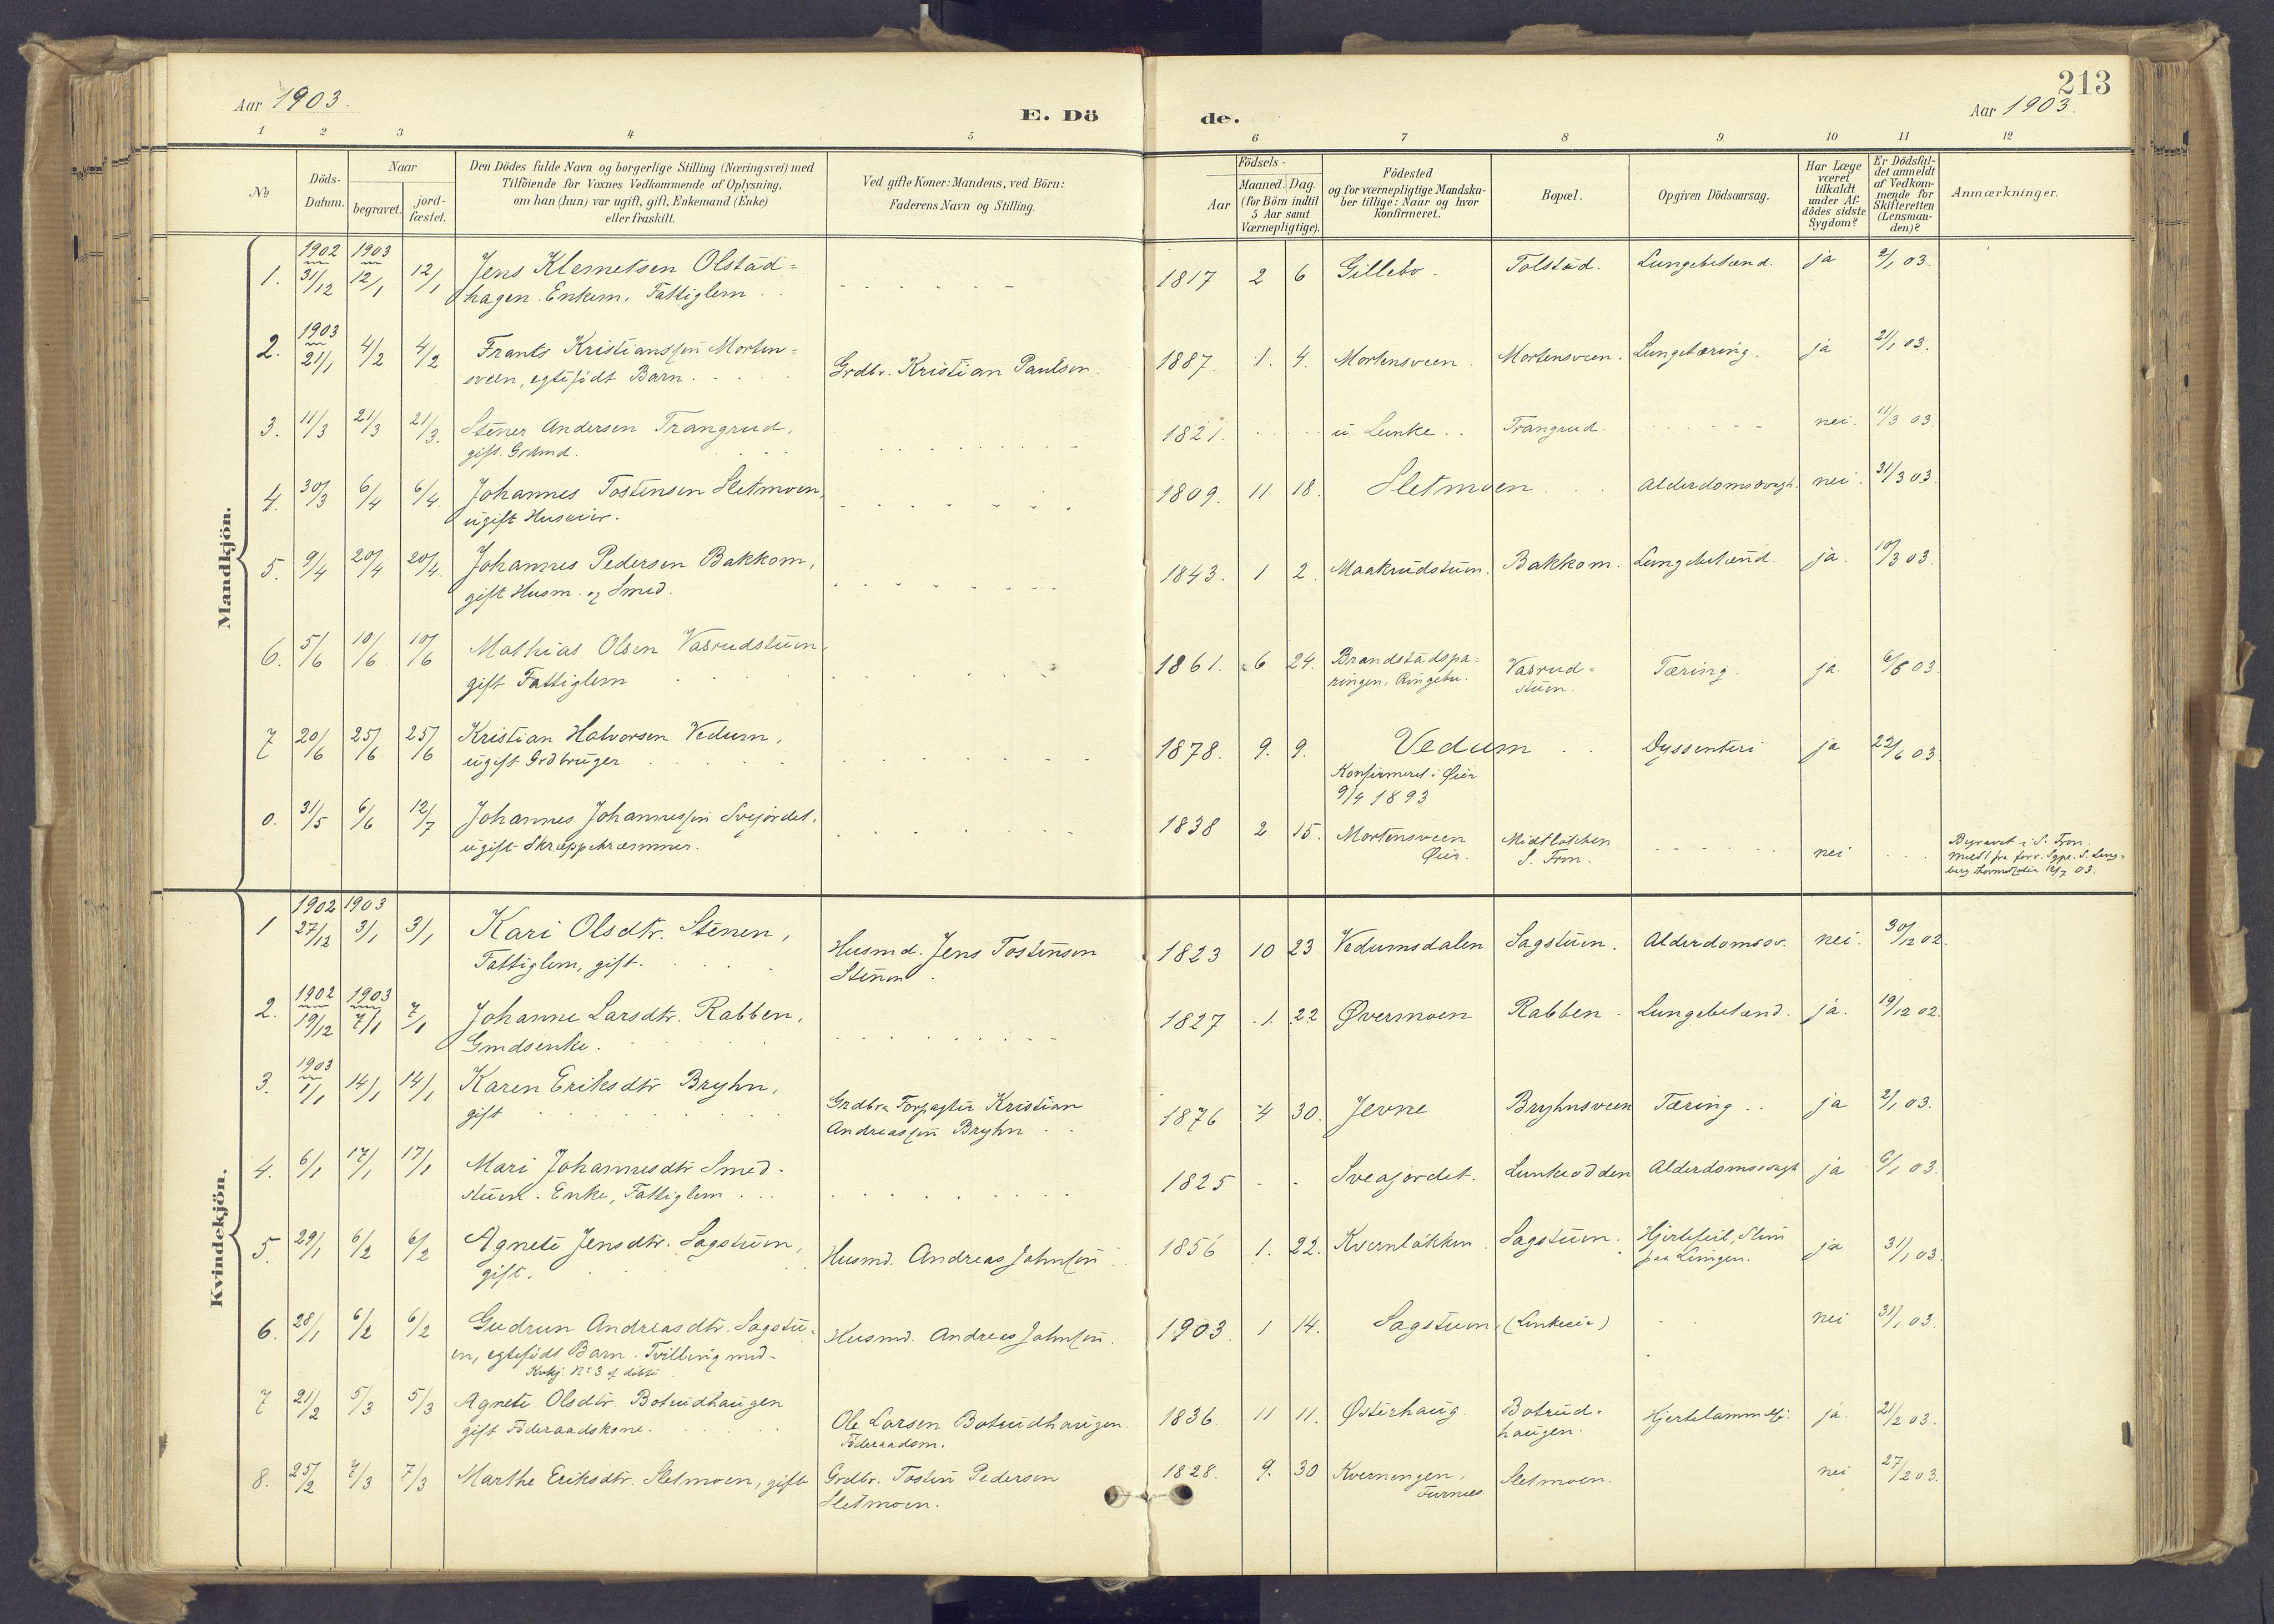 SAH, Øyer prestekontor, Ministerialbok nr. 12, 1897-1920, s. 213